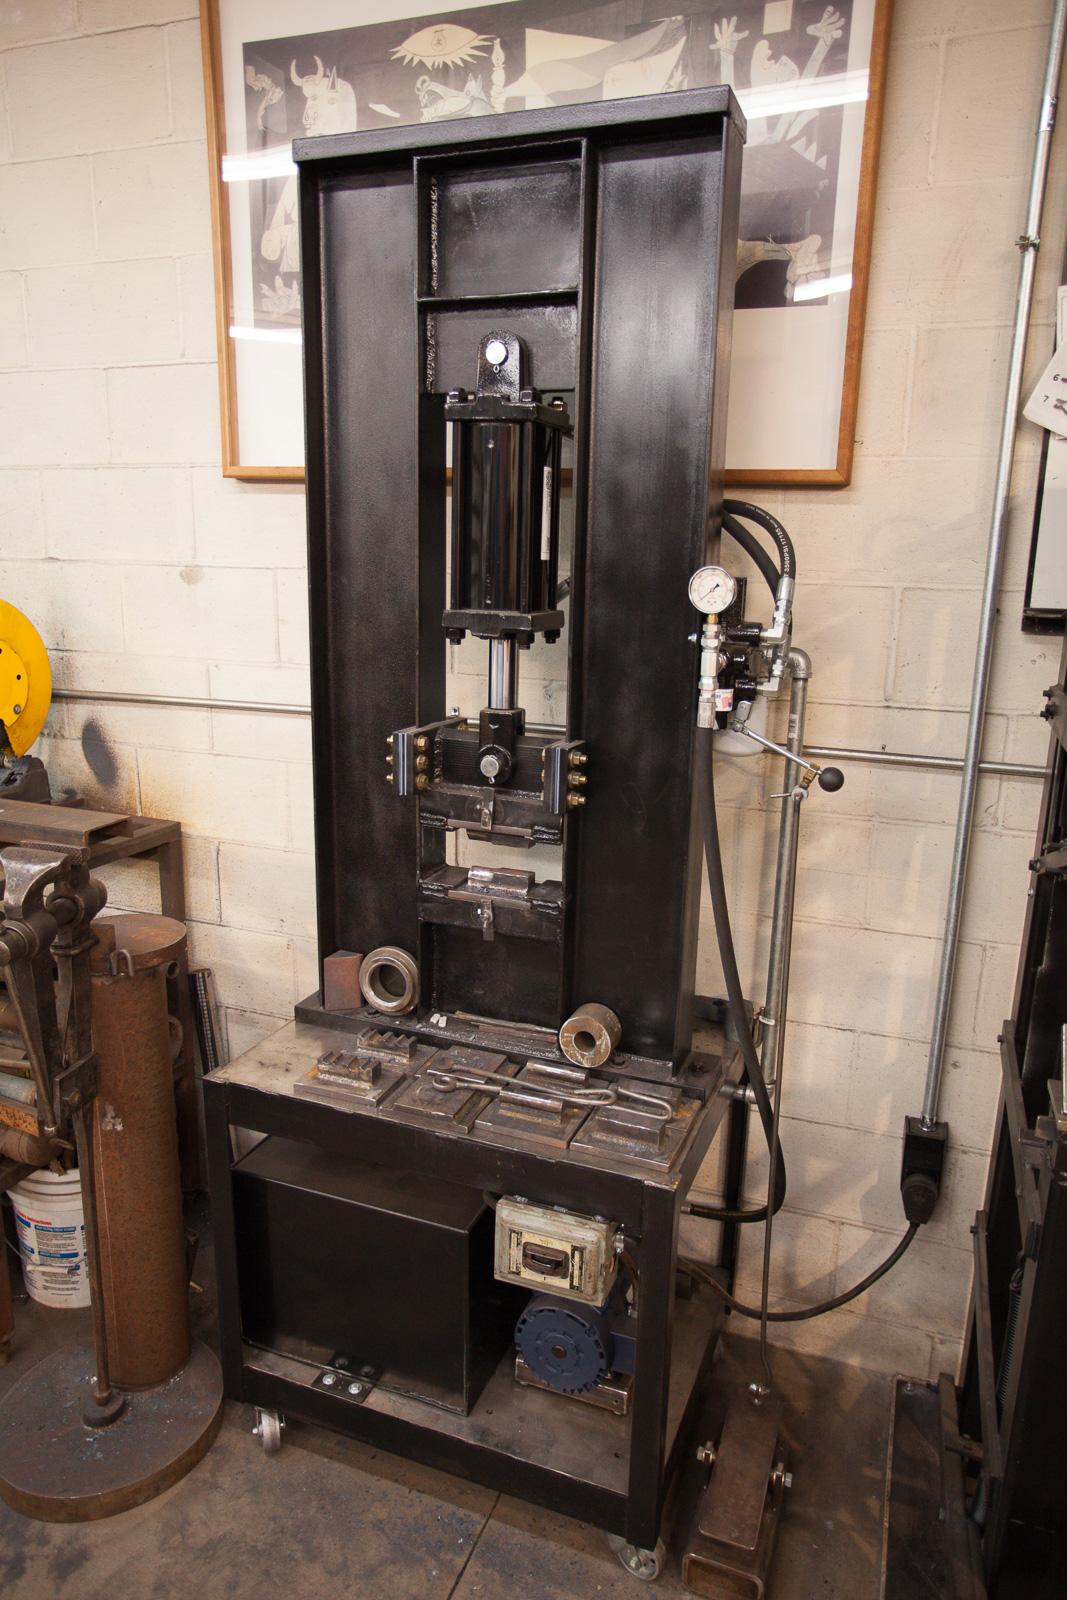 Hydraulic Press Build - Presses - Blacksmith Forums